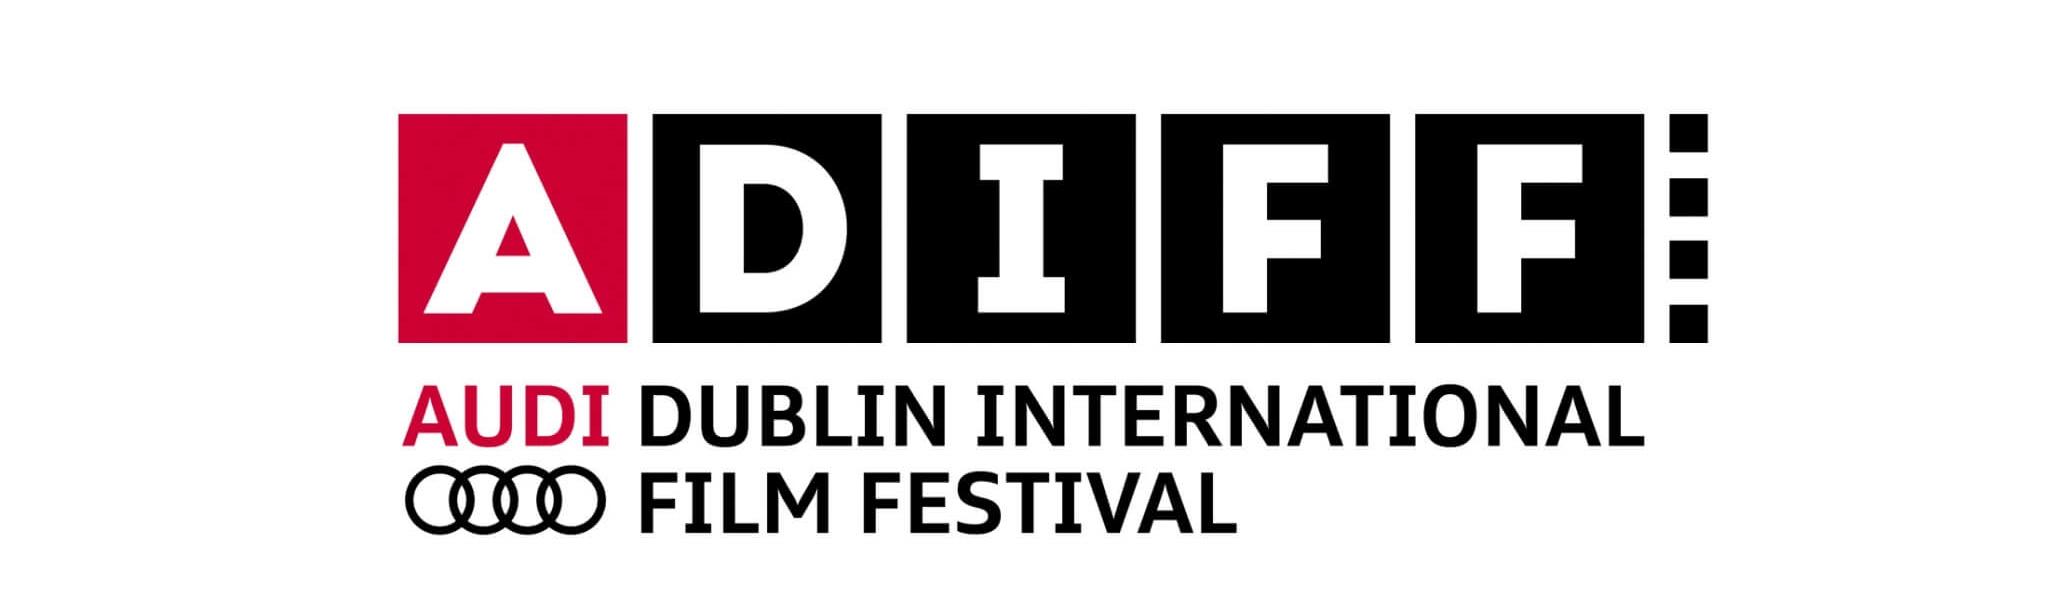 ADIFF Logo